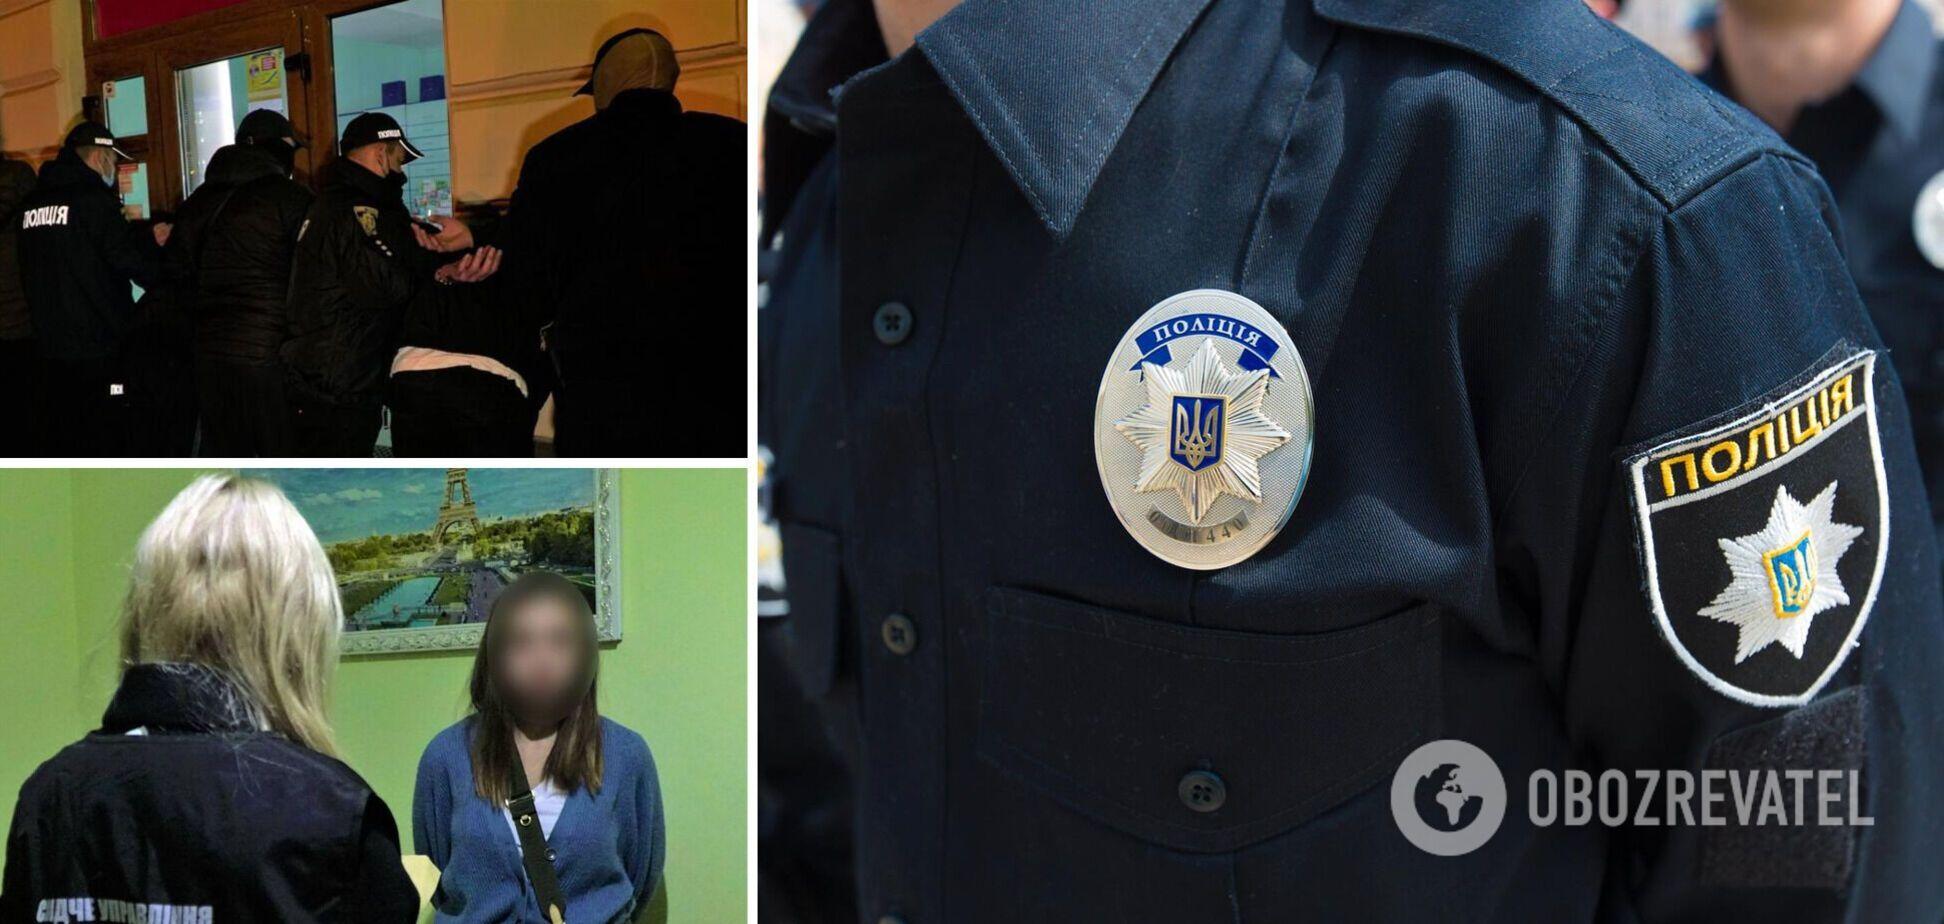 Требовали 2 млн евро: во Львове задержали банду, похитившую девушку. Фото